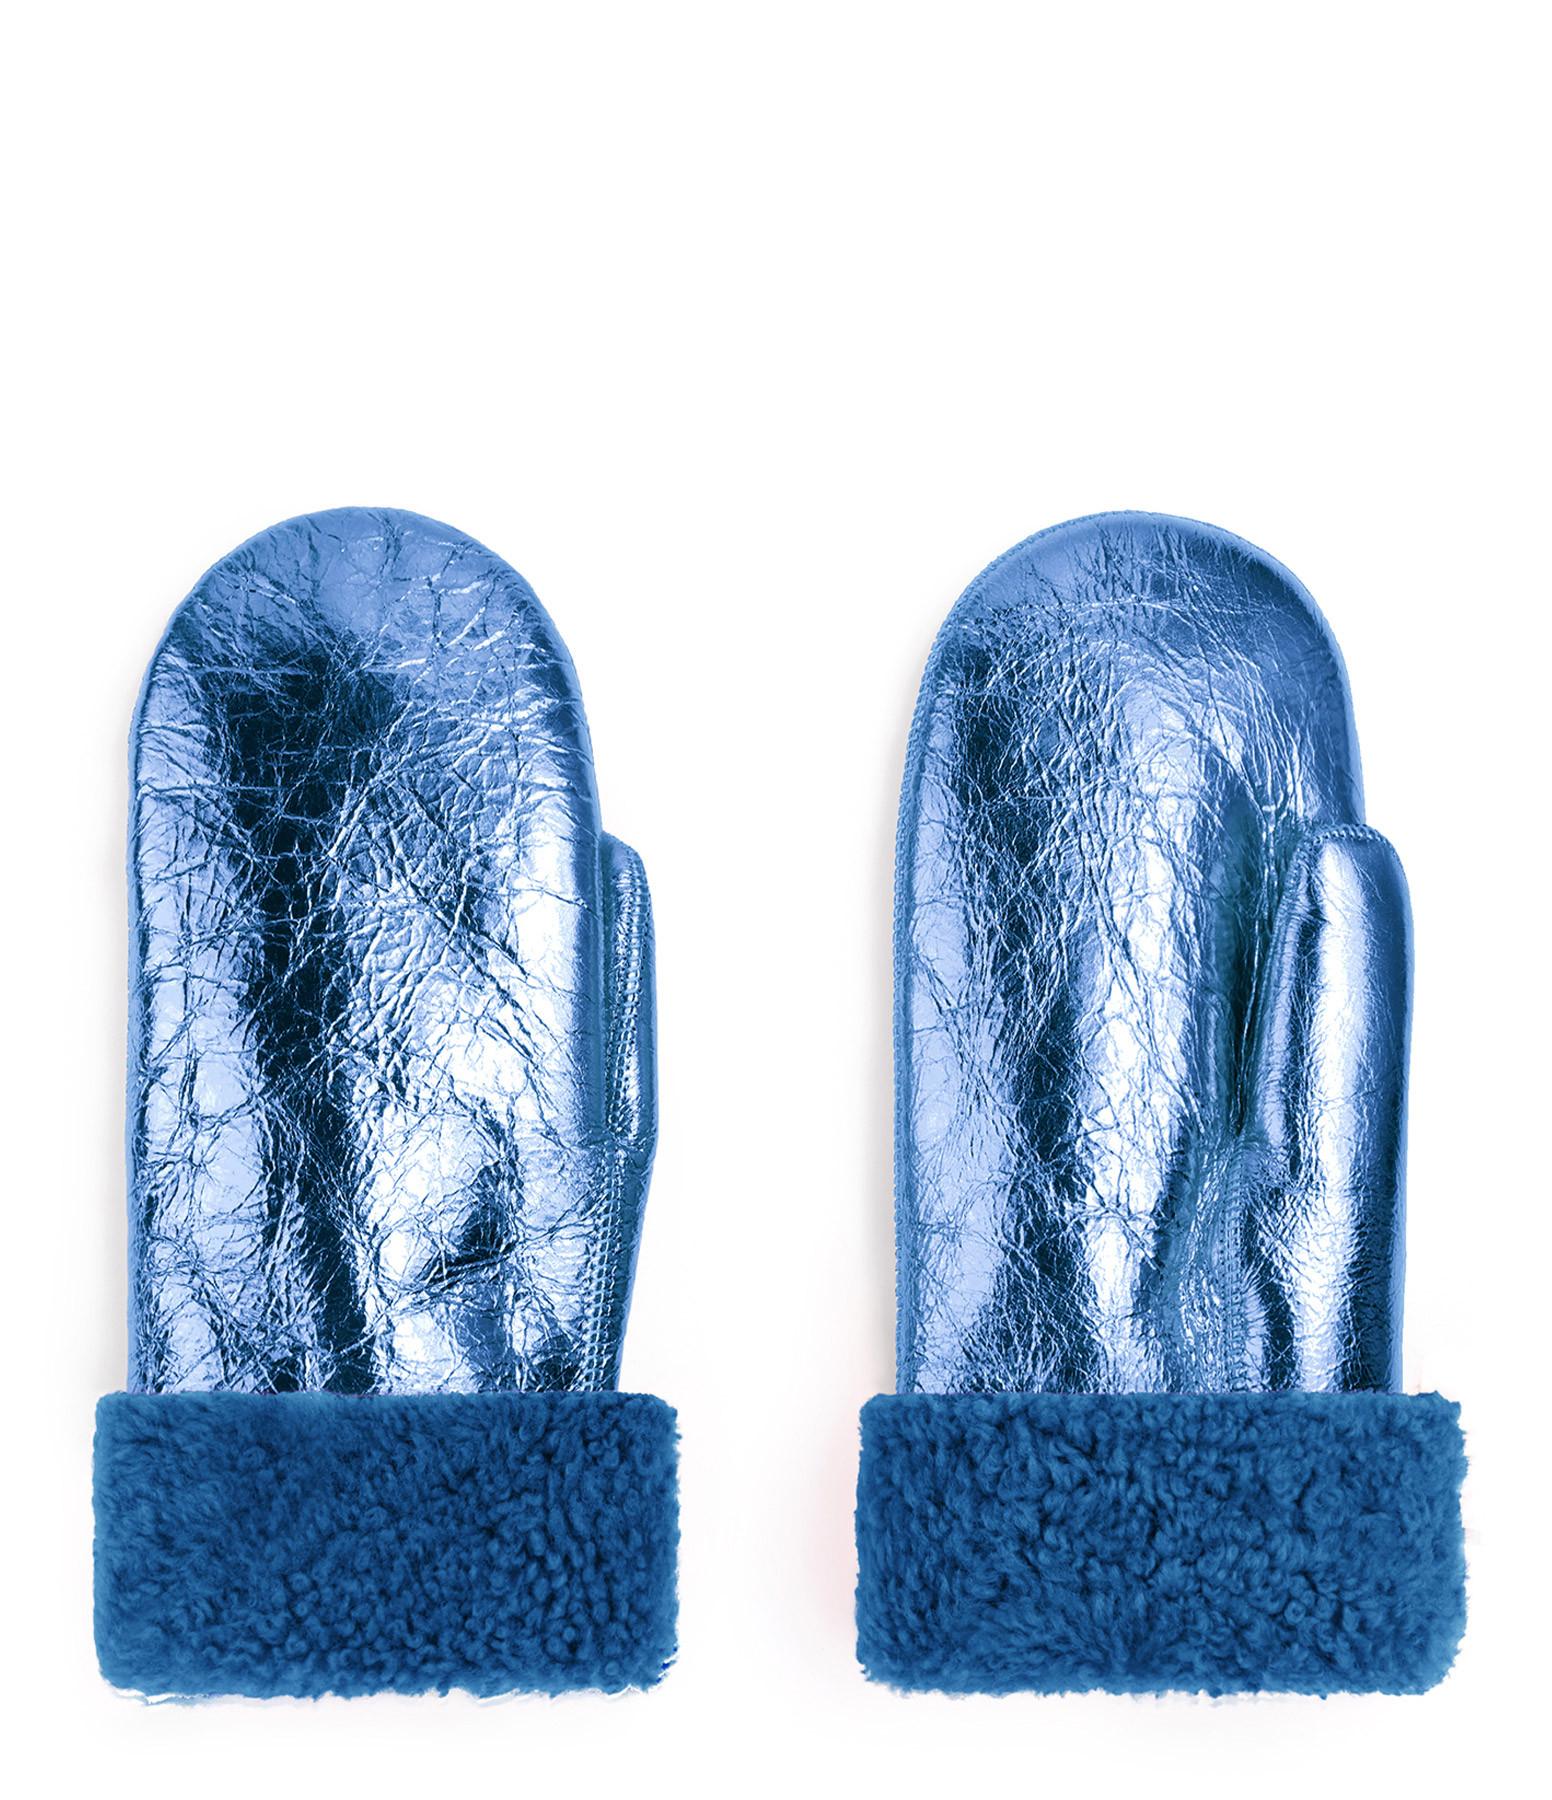 TOASTIES - Moufles Bleu Métallique